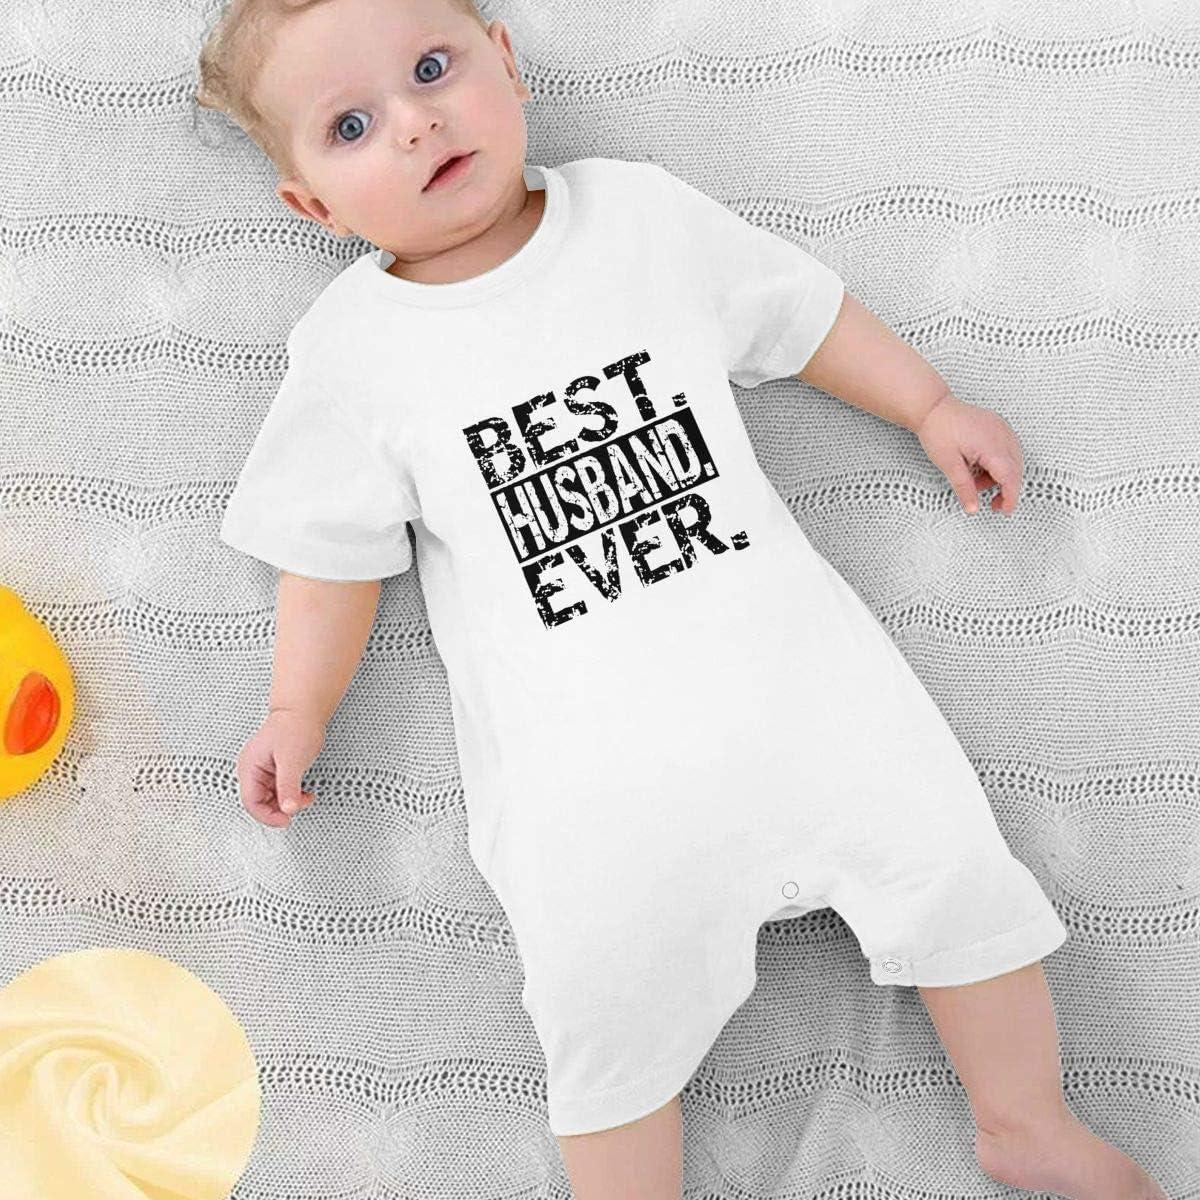 Sherrygeoffrey Best Husband Ever Boy Girls Bodysuit Warm Onesies Infant White